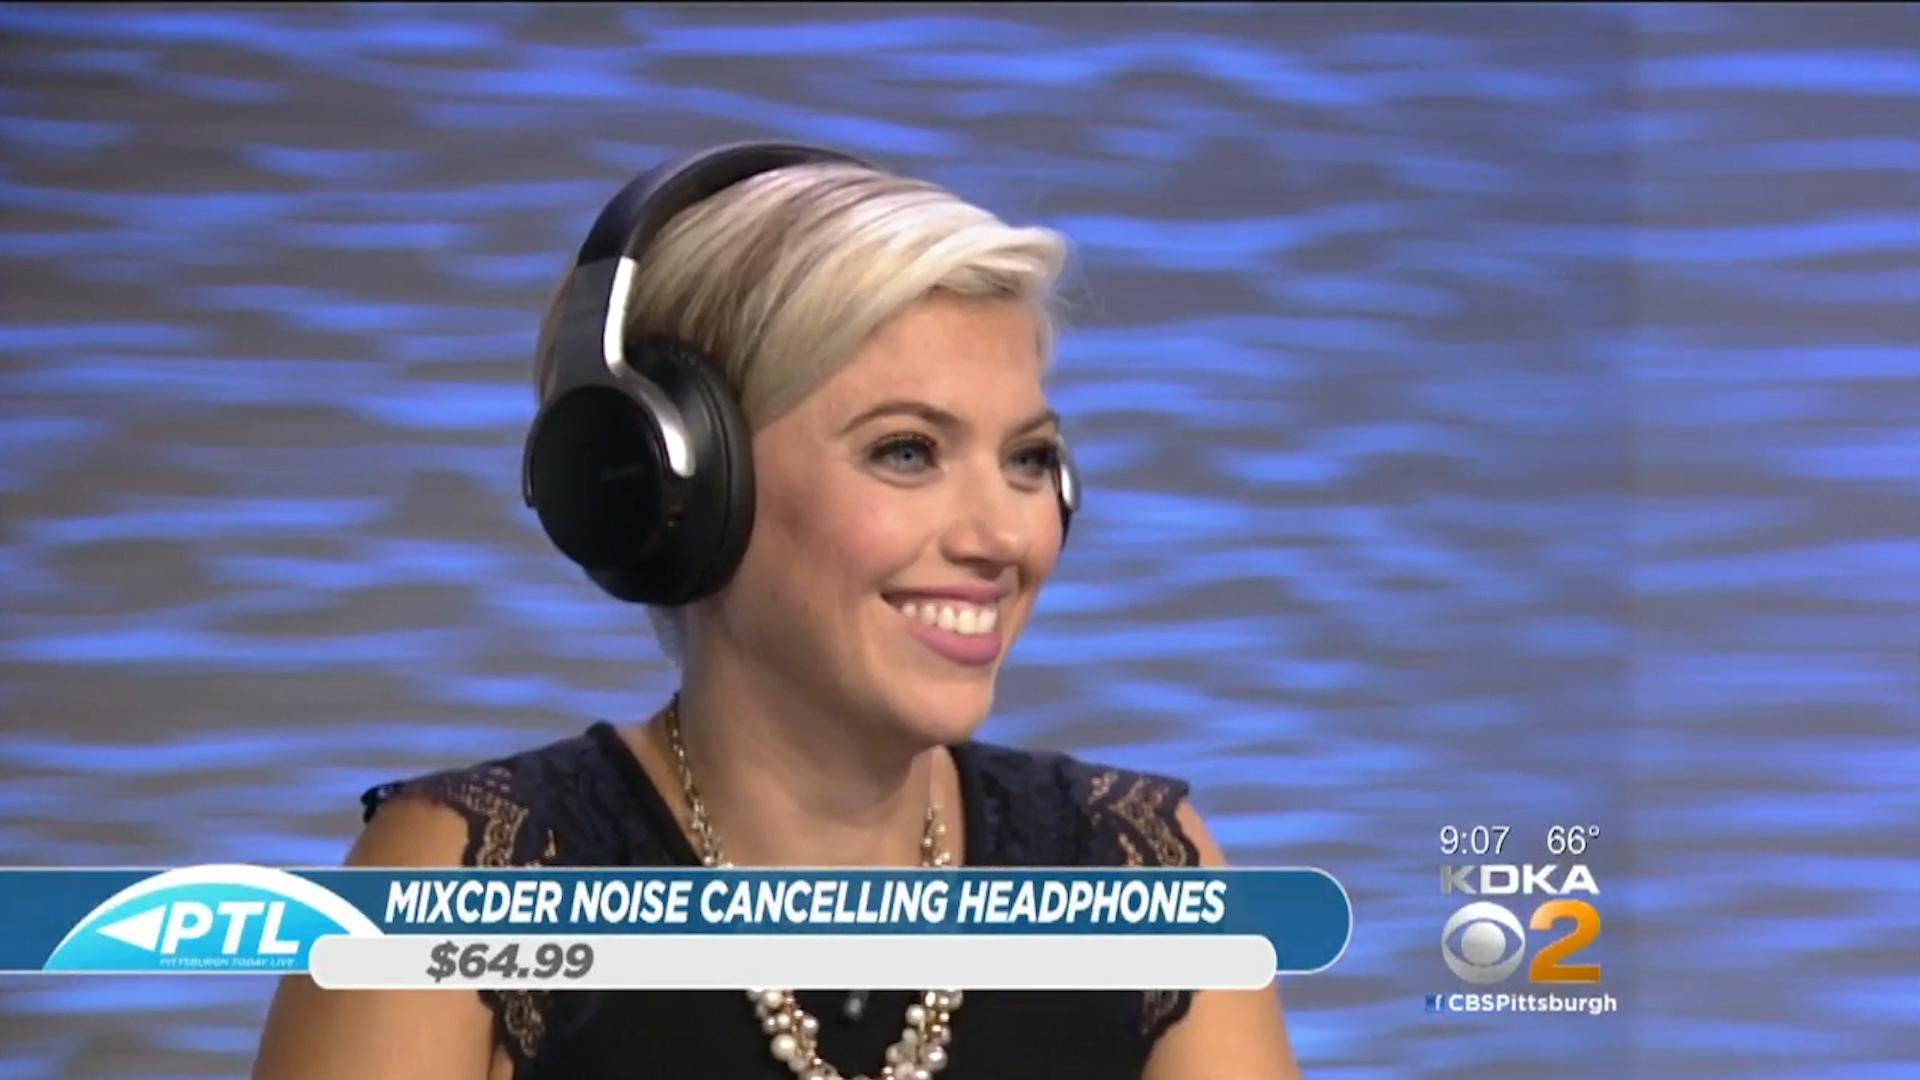 MIXCDER E7 BLUETOOTH NOISE CANCELLING HEADPHONES - $64.99Shop Now